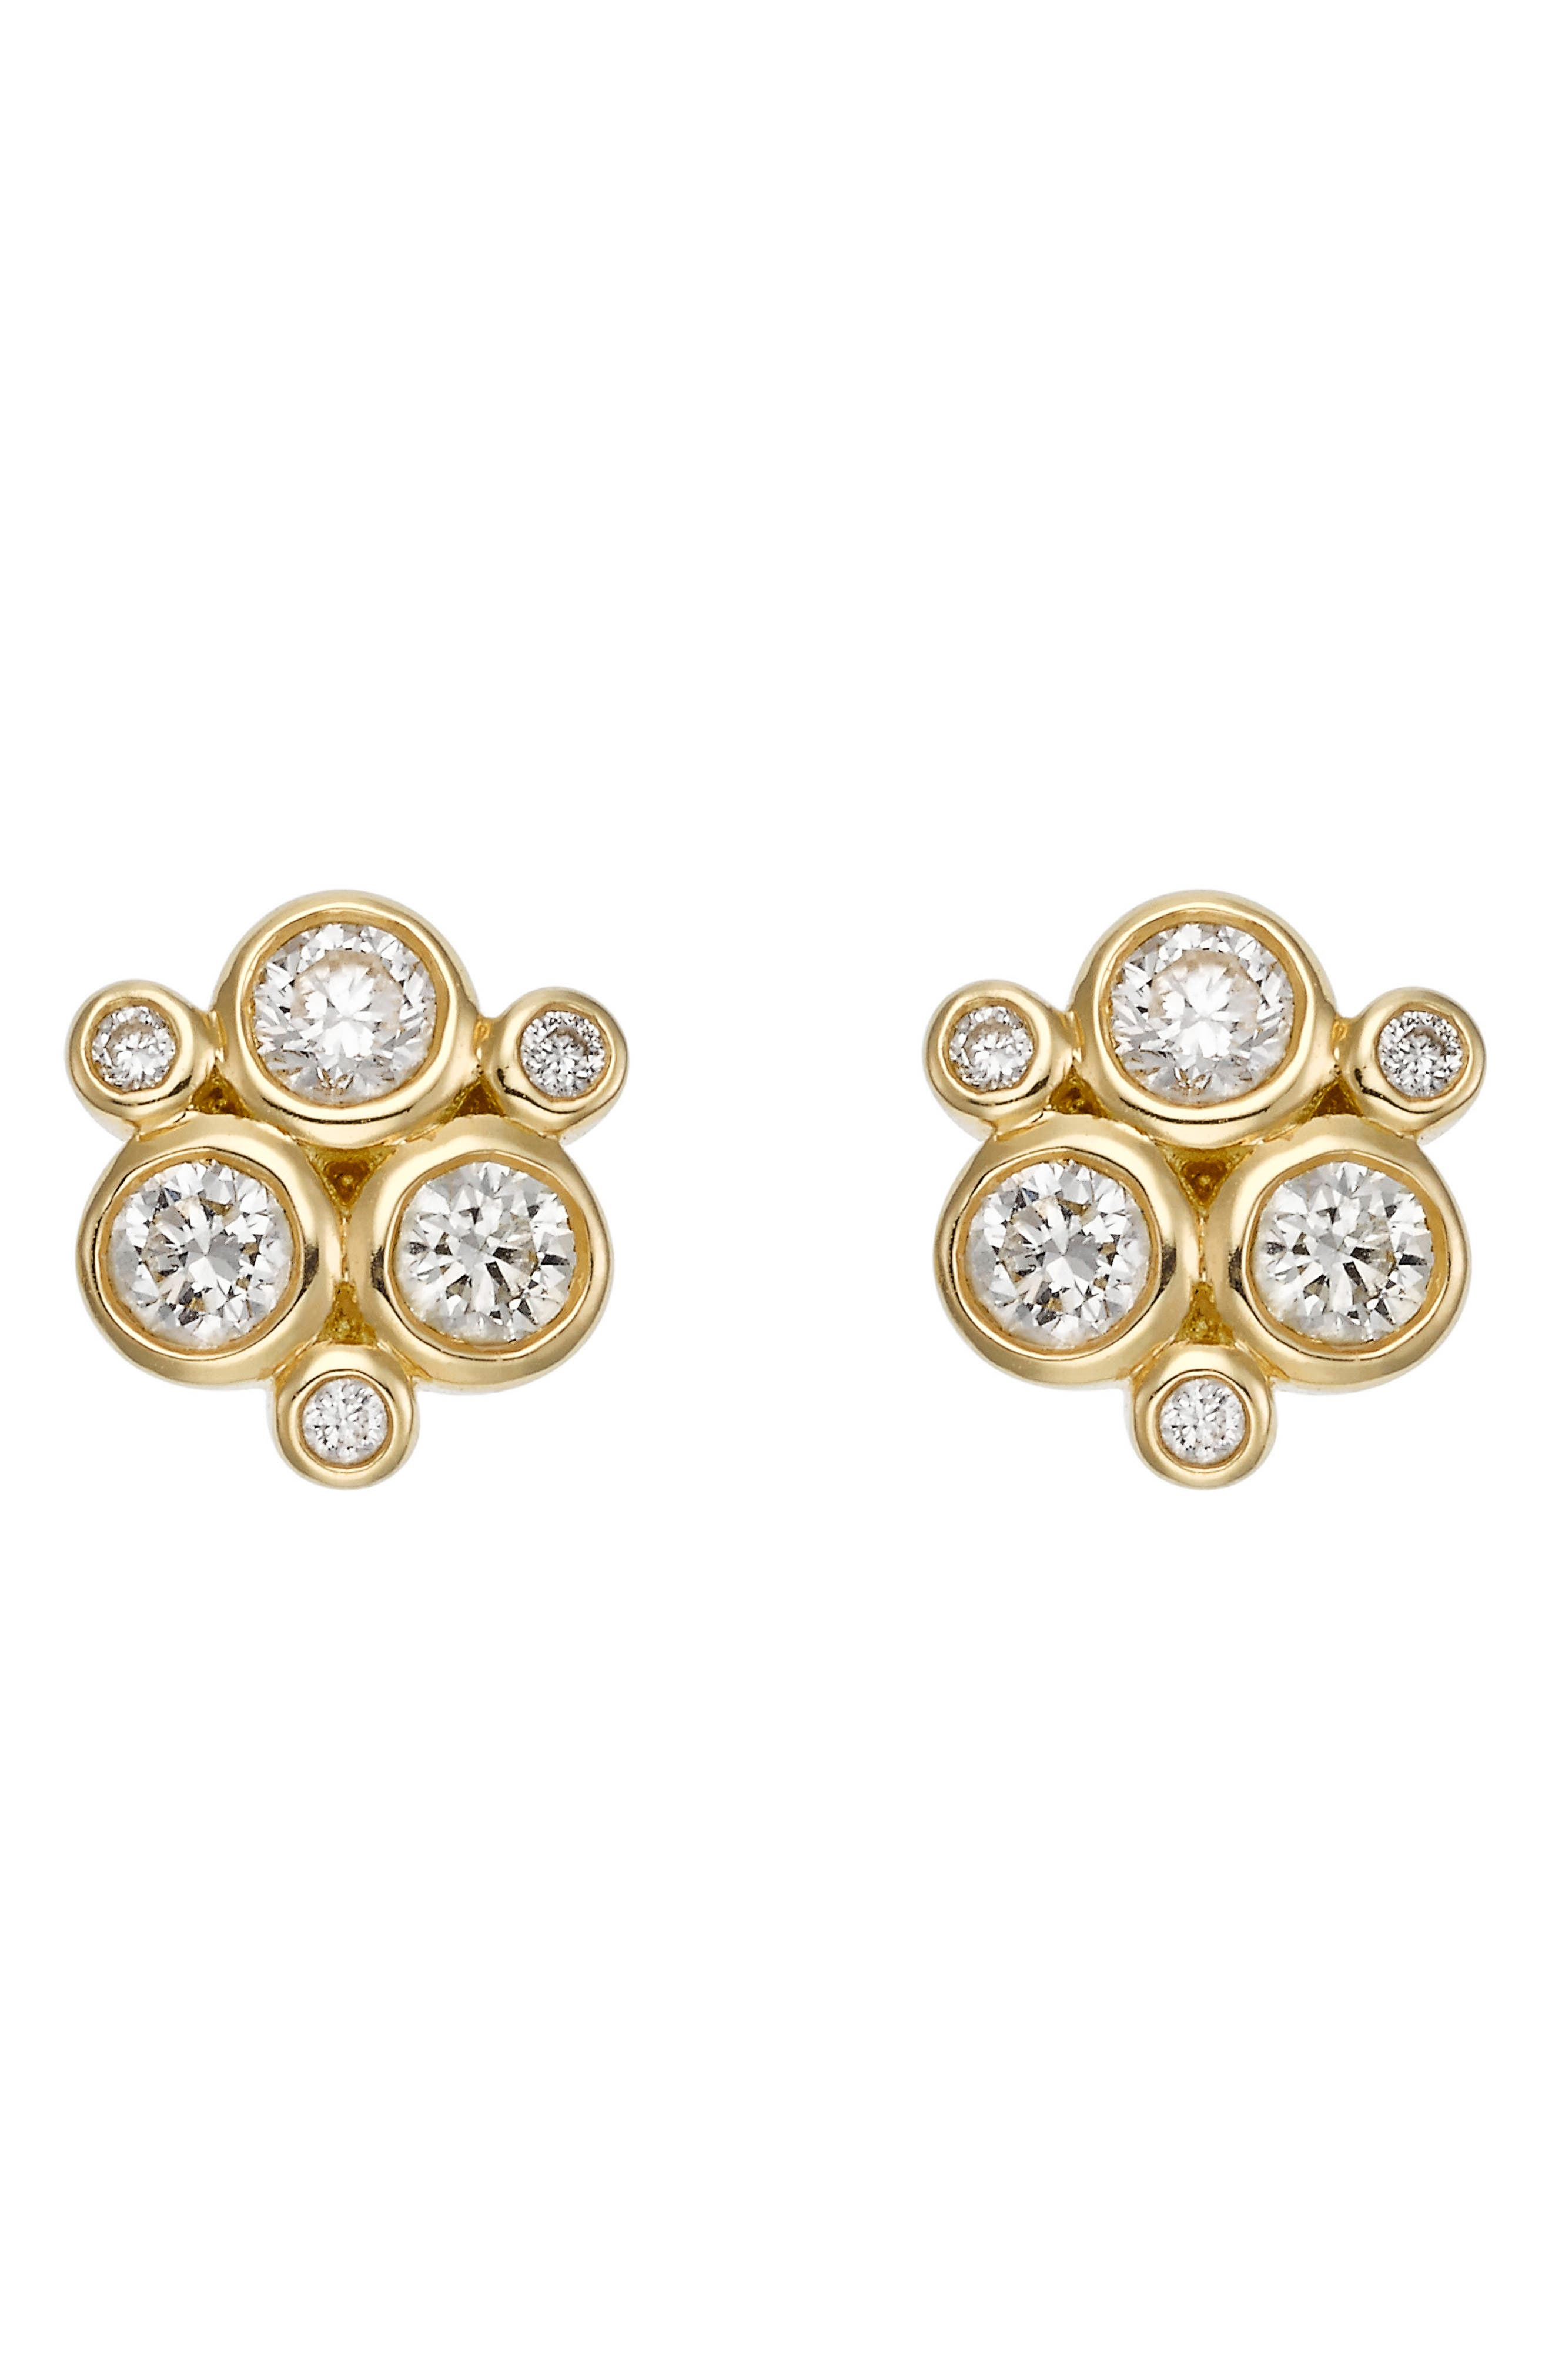 Alternate Image 1 Selected - Temple St. Clair Diamond Stud Earrings